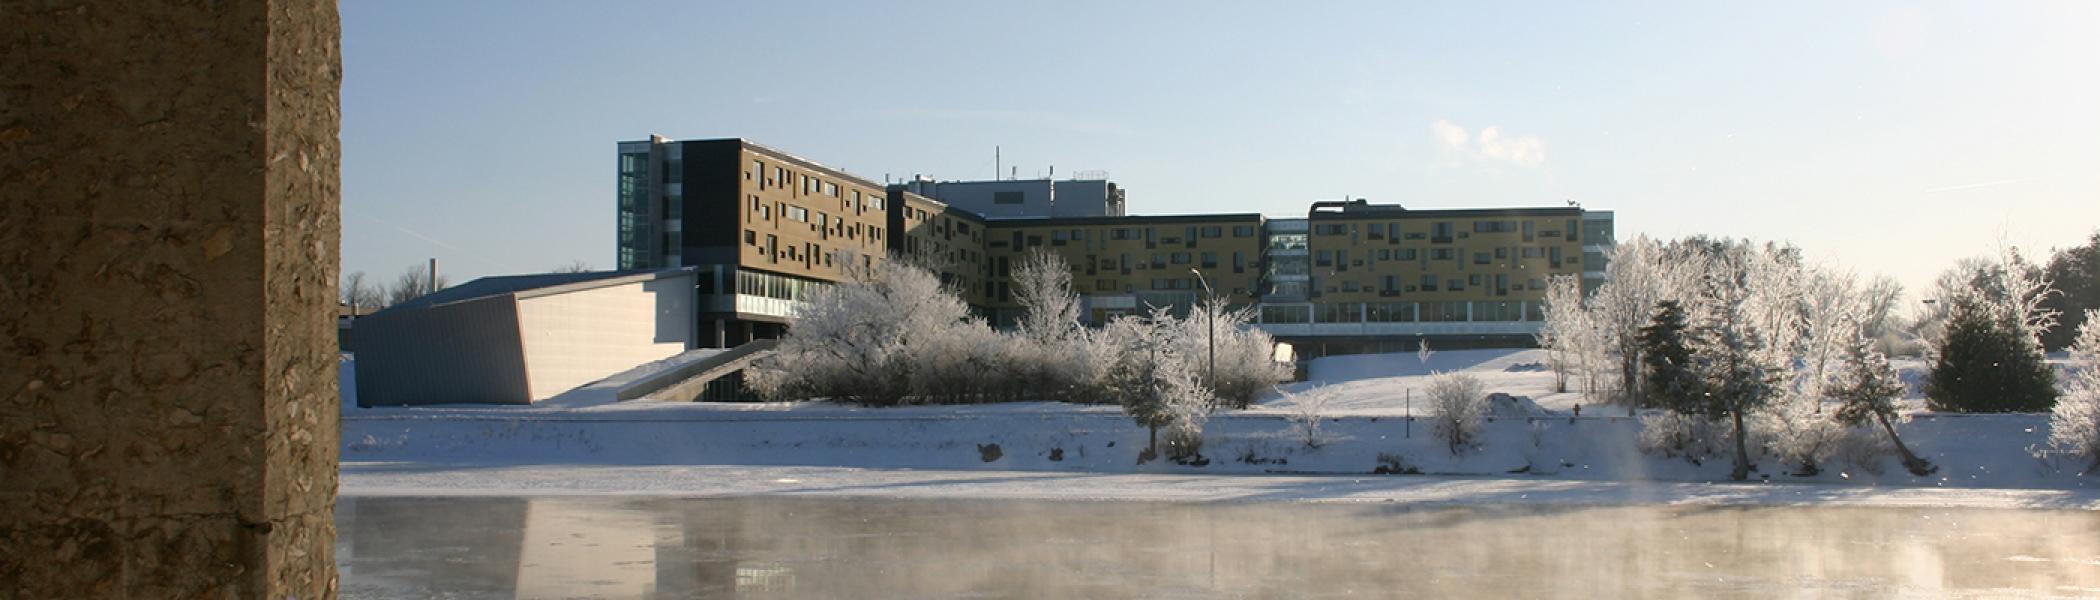 Peter Gzowski College in winter